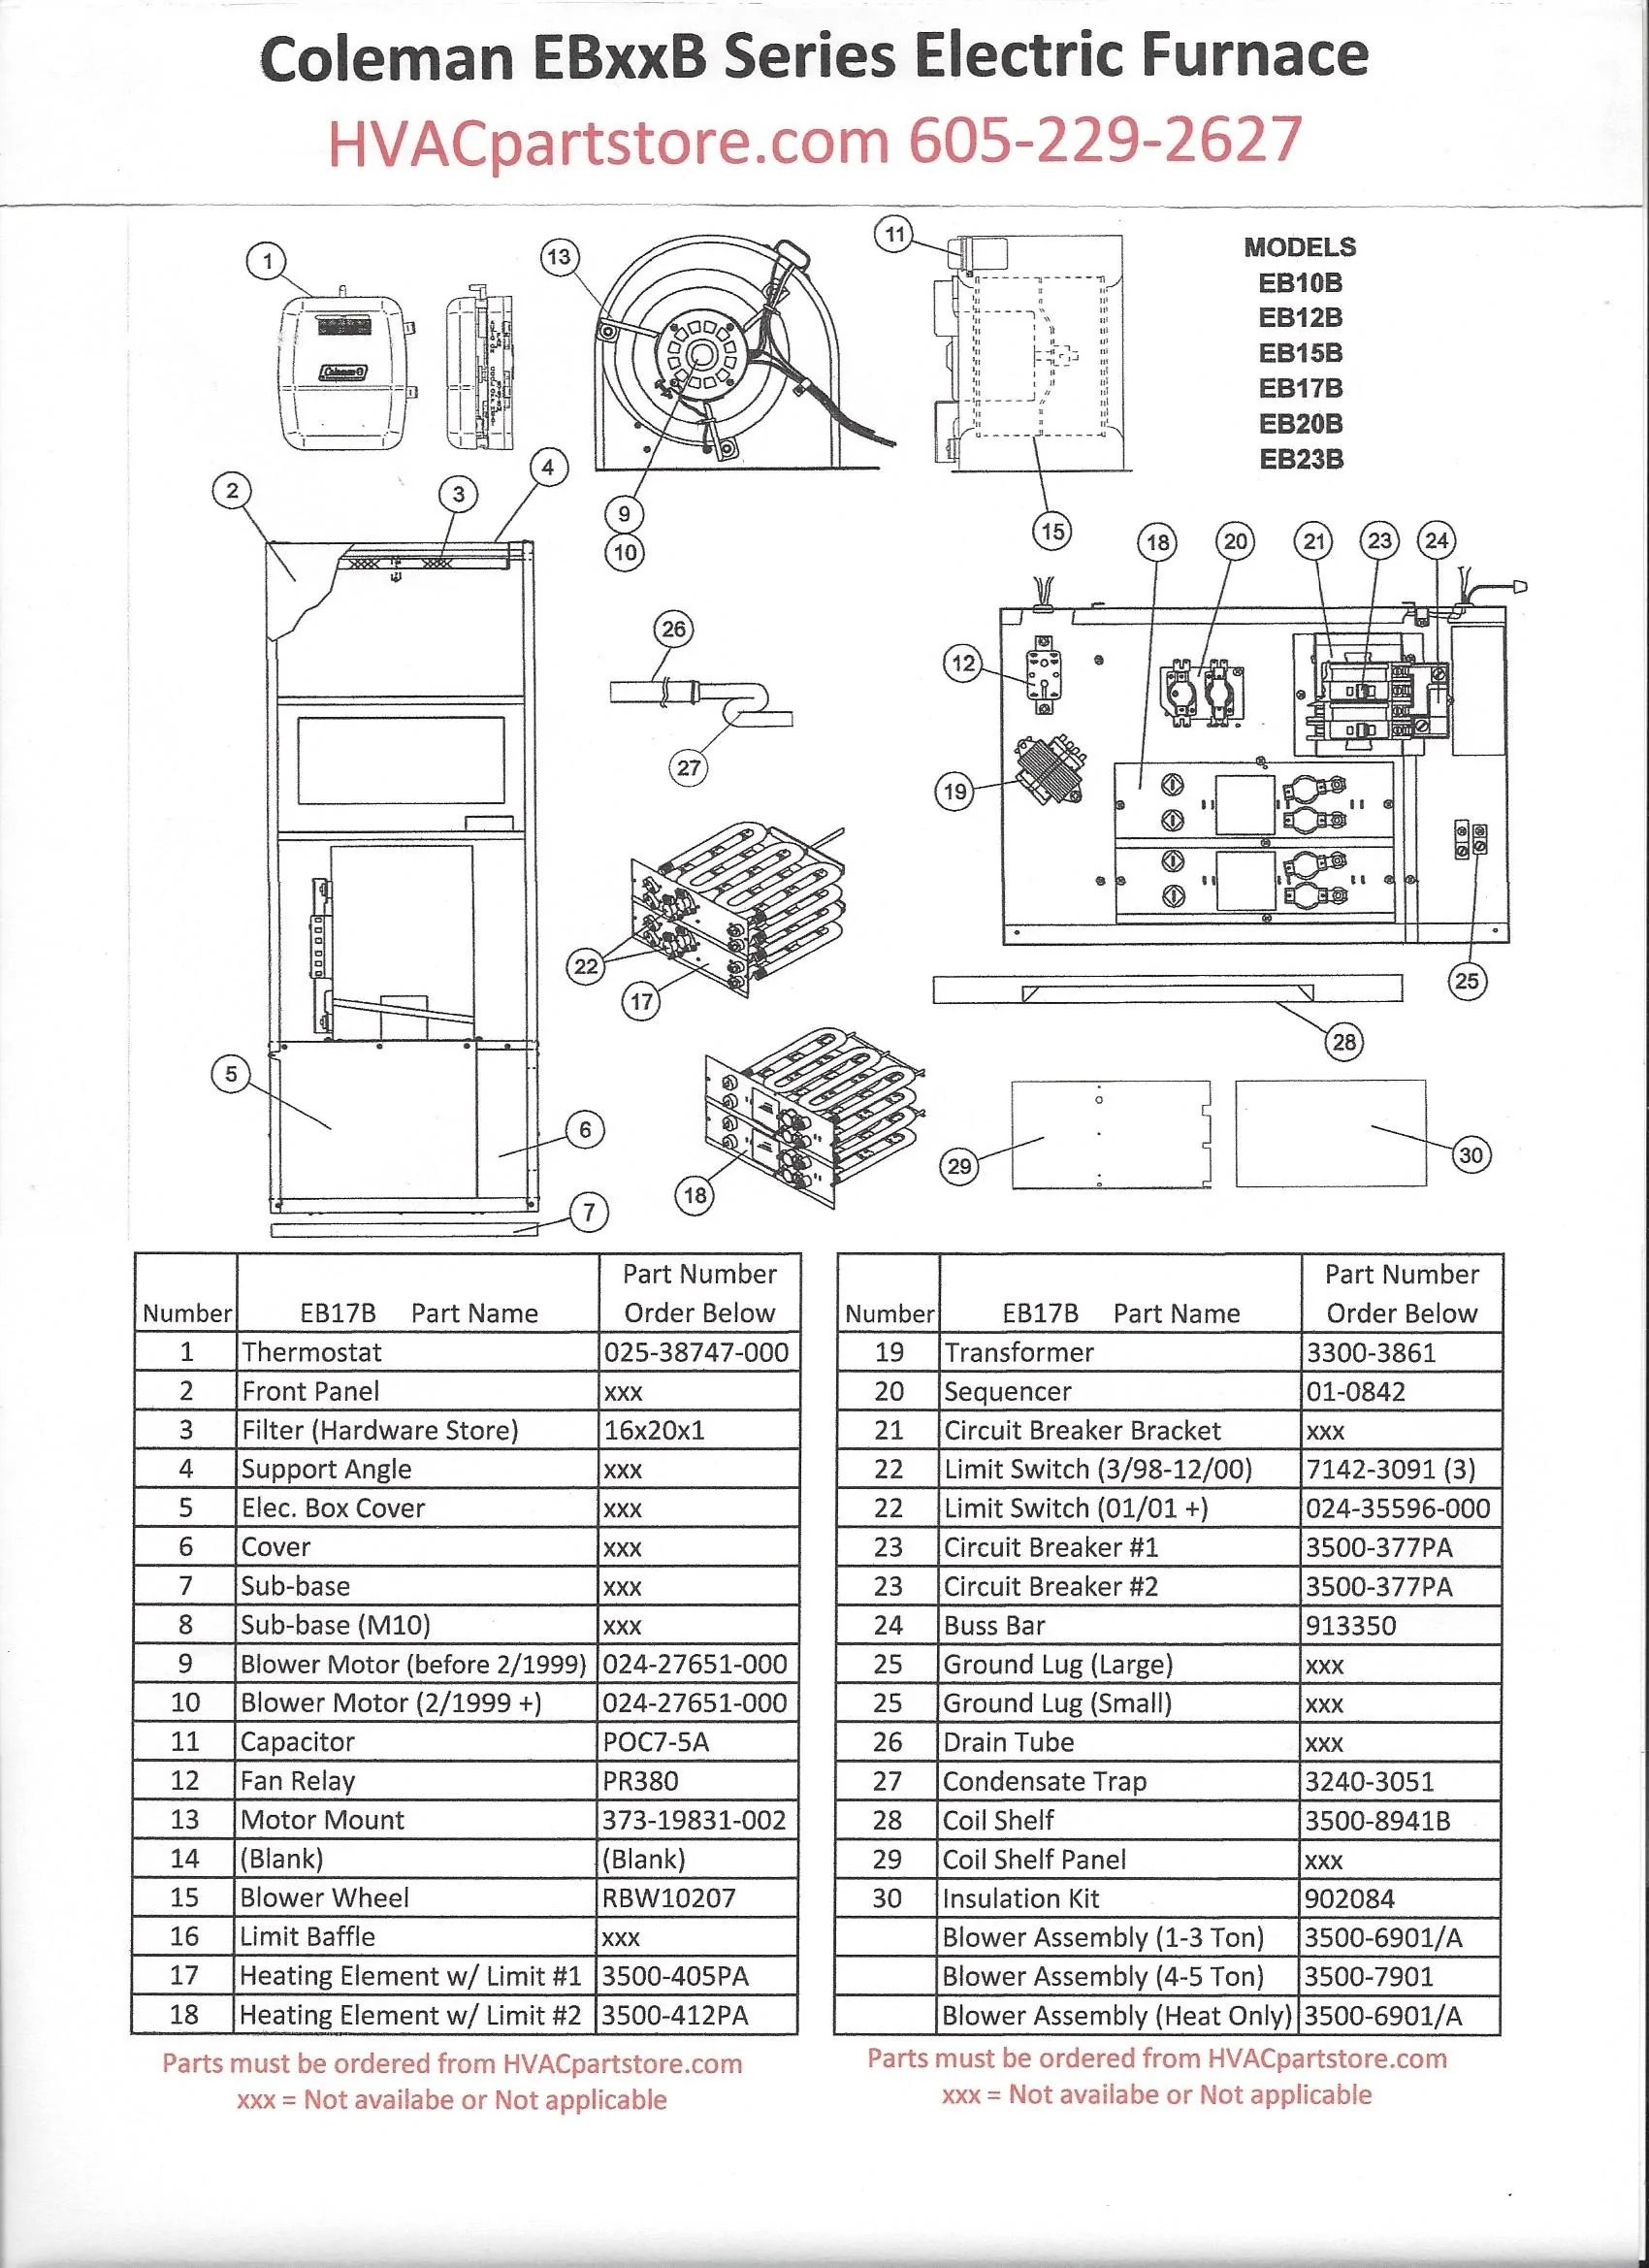 EB17B Coleman Electric Furnace Parts – HVACpartstore